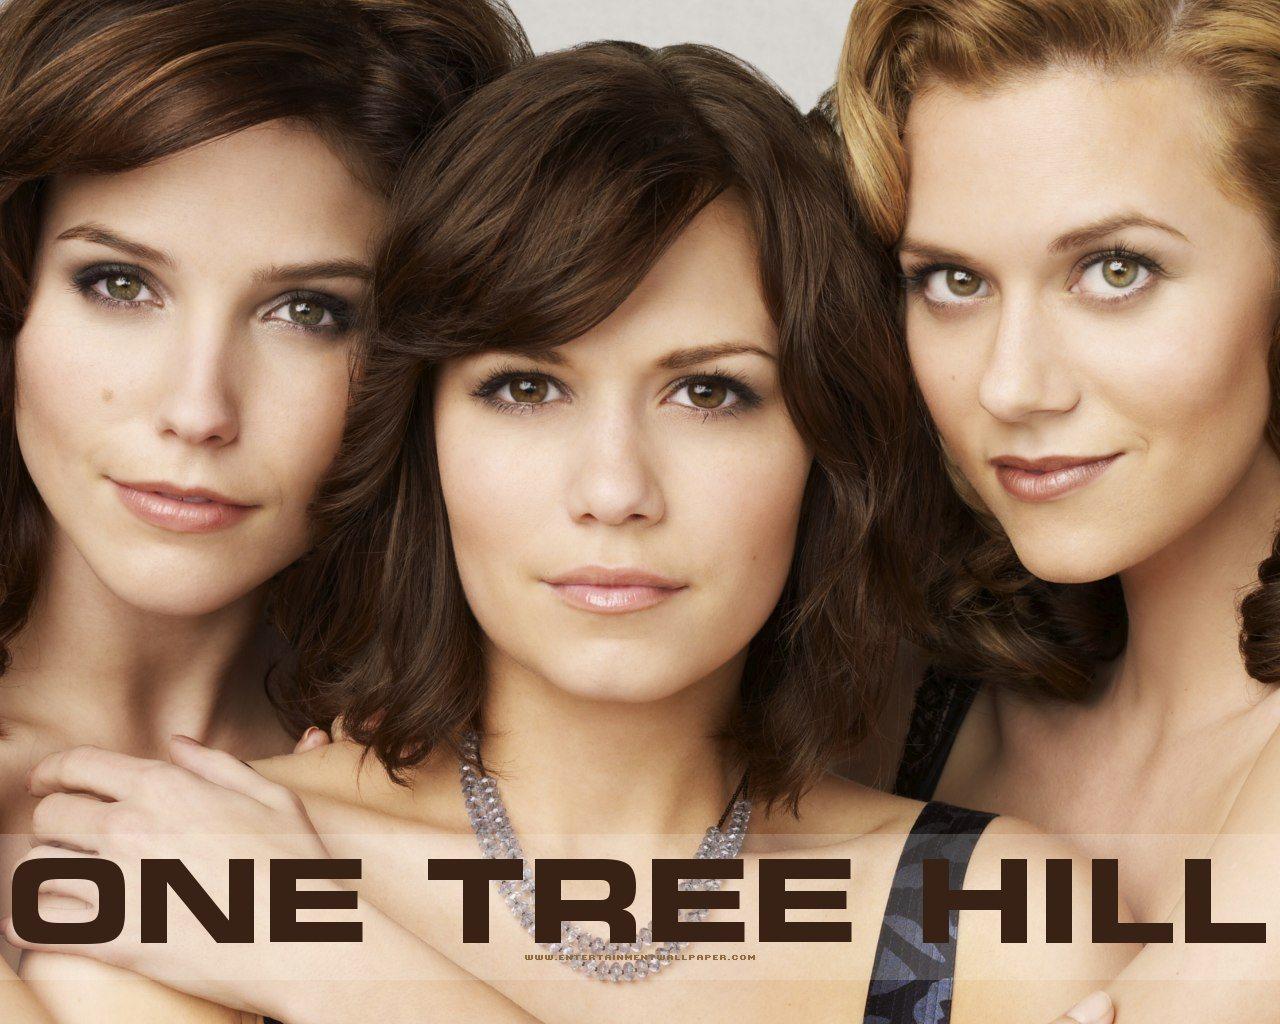 One дерево холм, хилл Girls